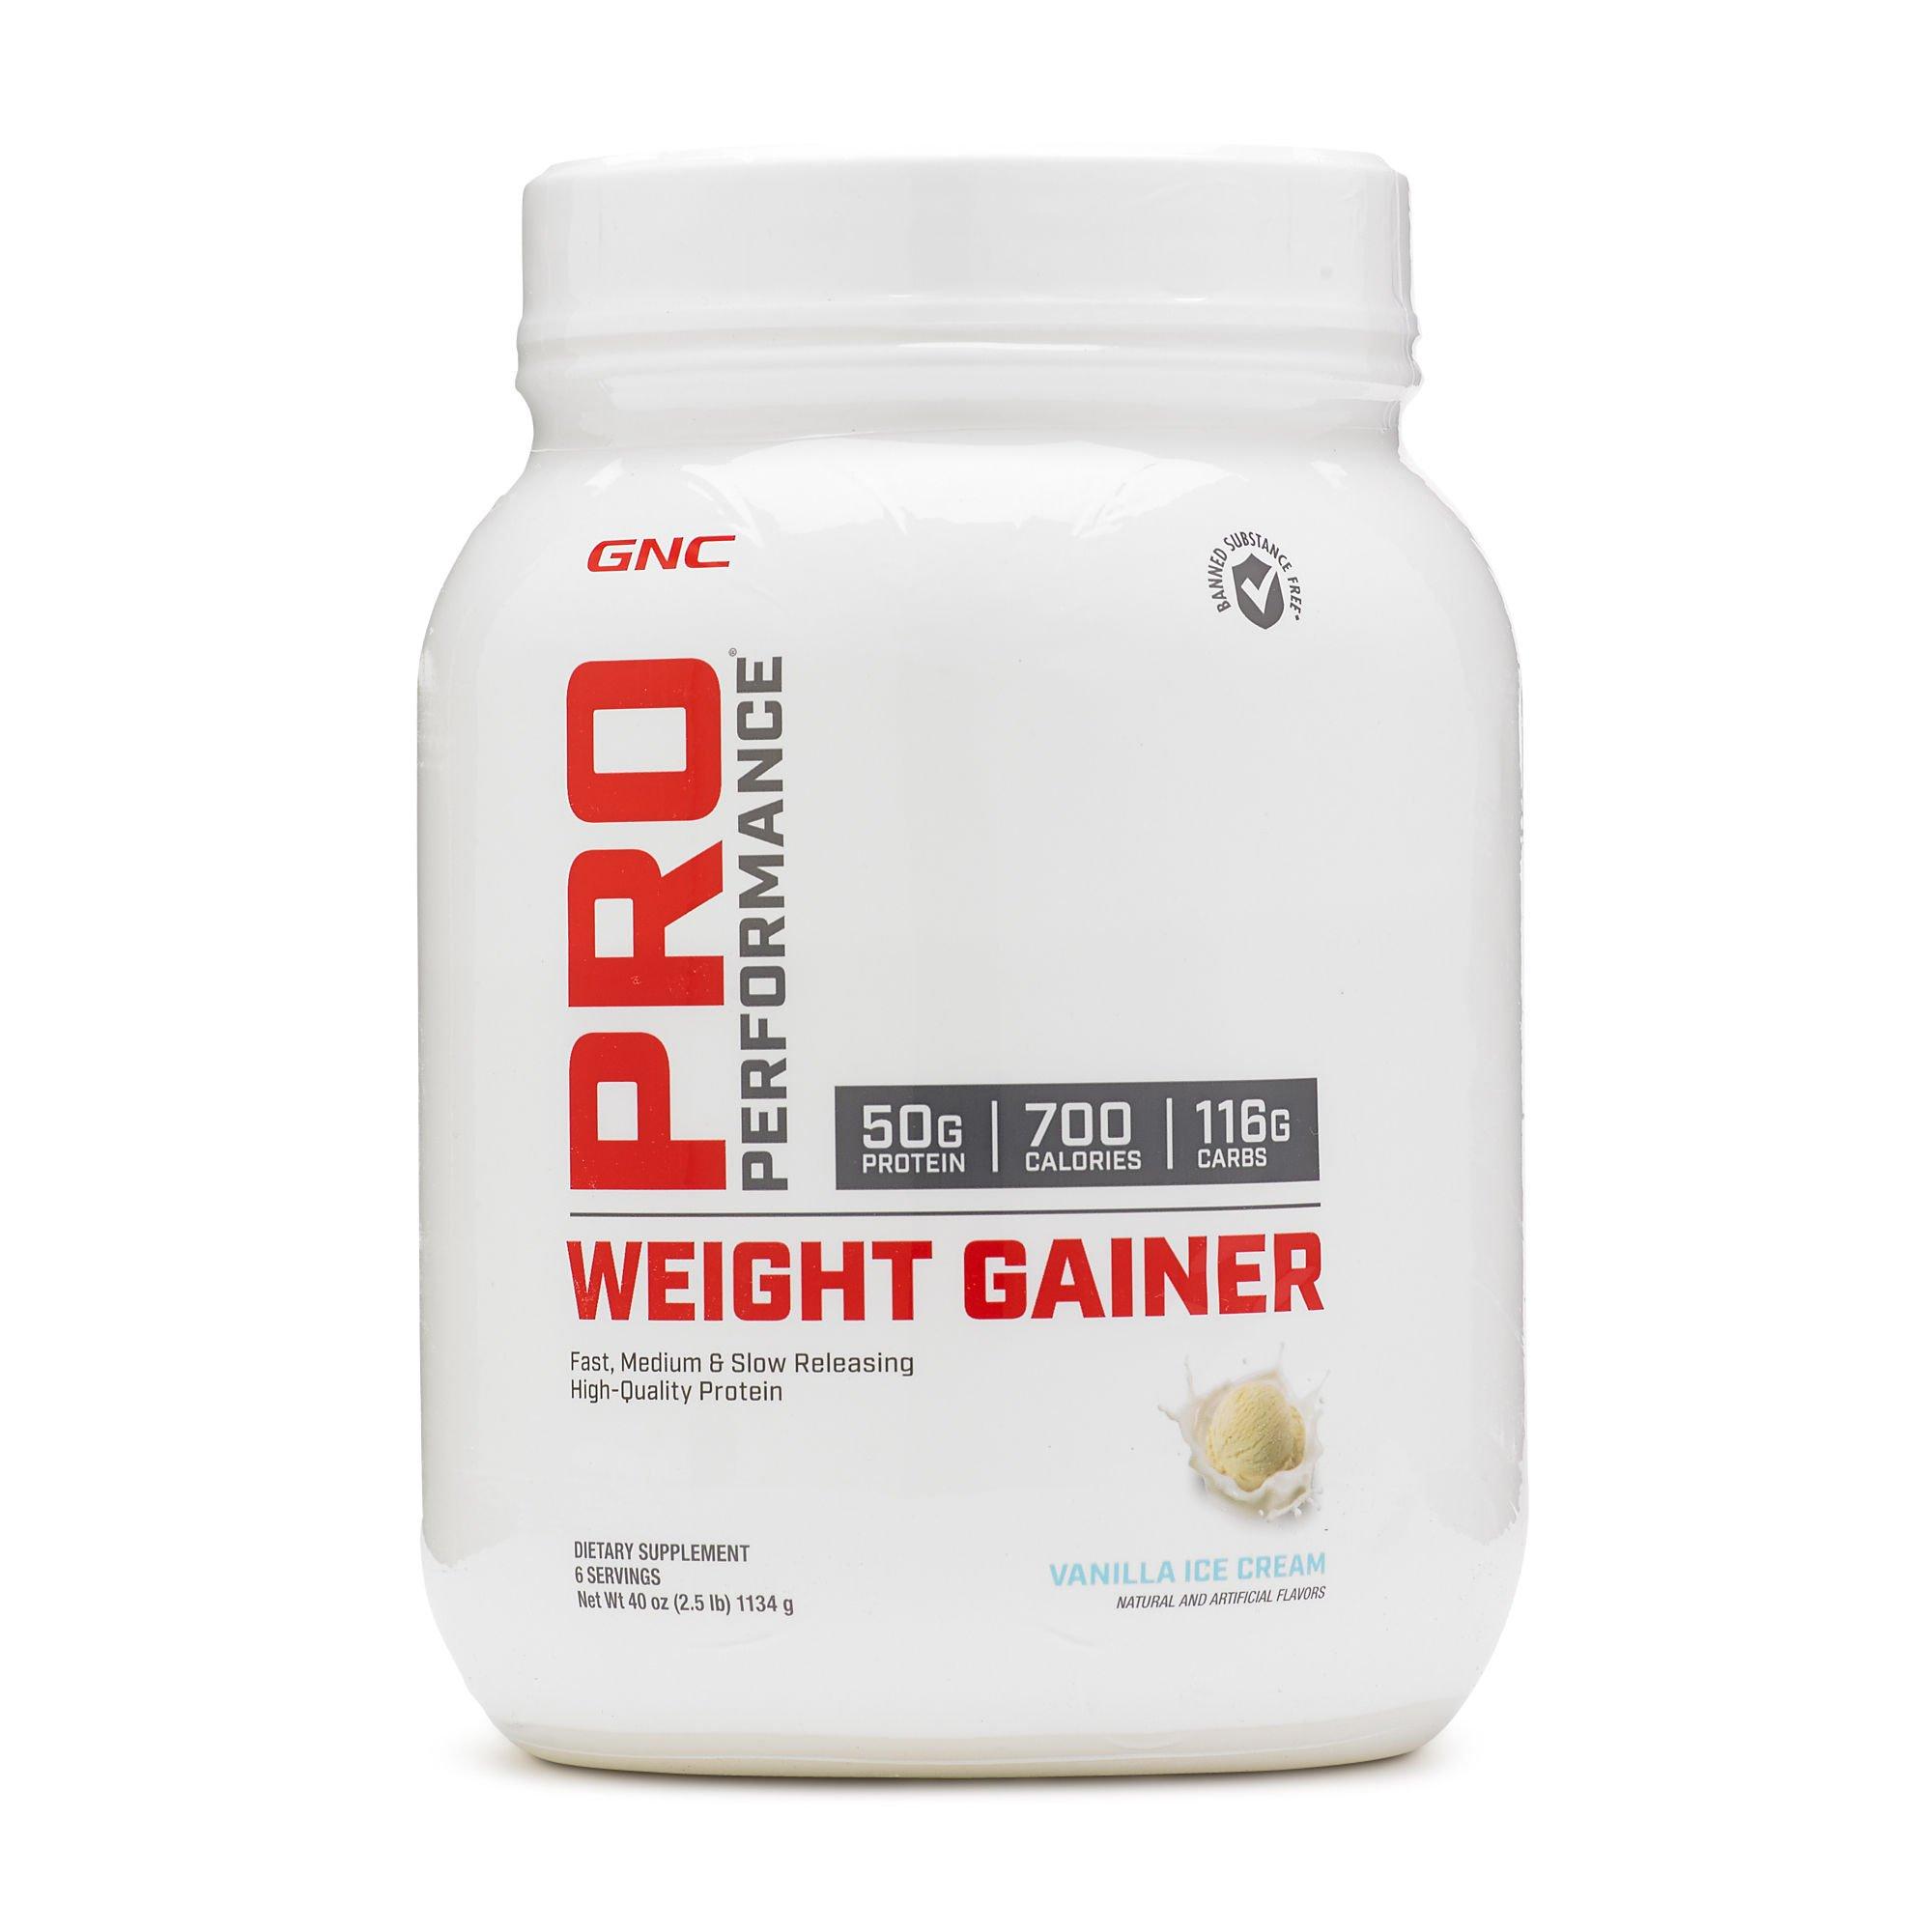 GNC Pro Performance Weight Gainer Vanilla Ice Cream 2.5 lbs.